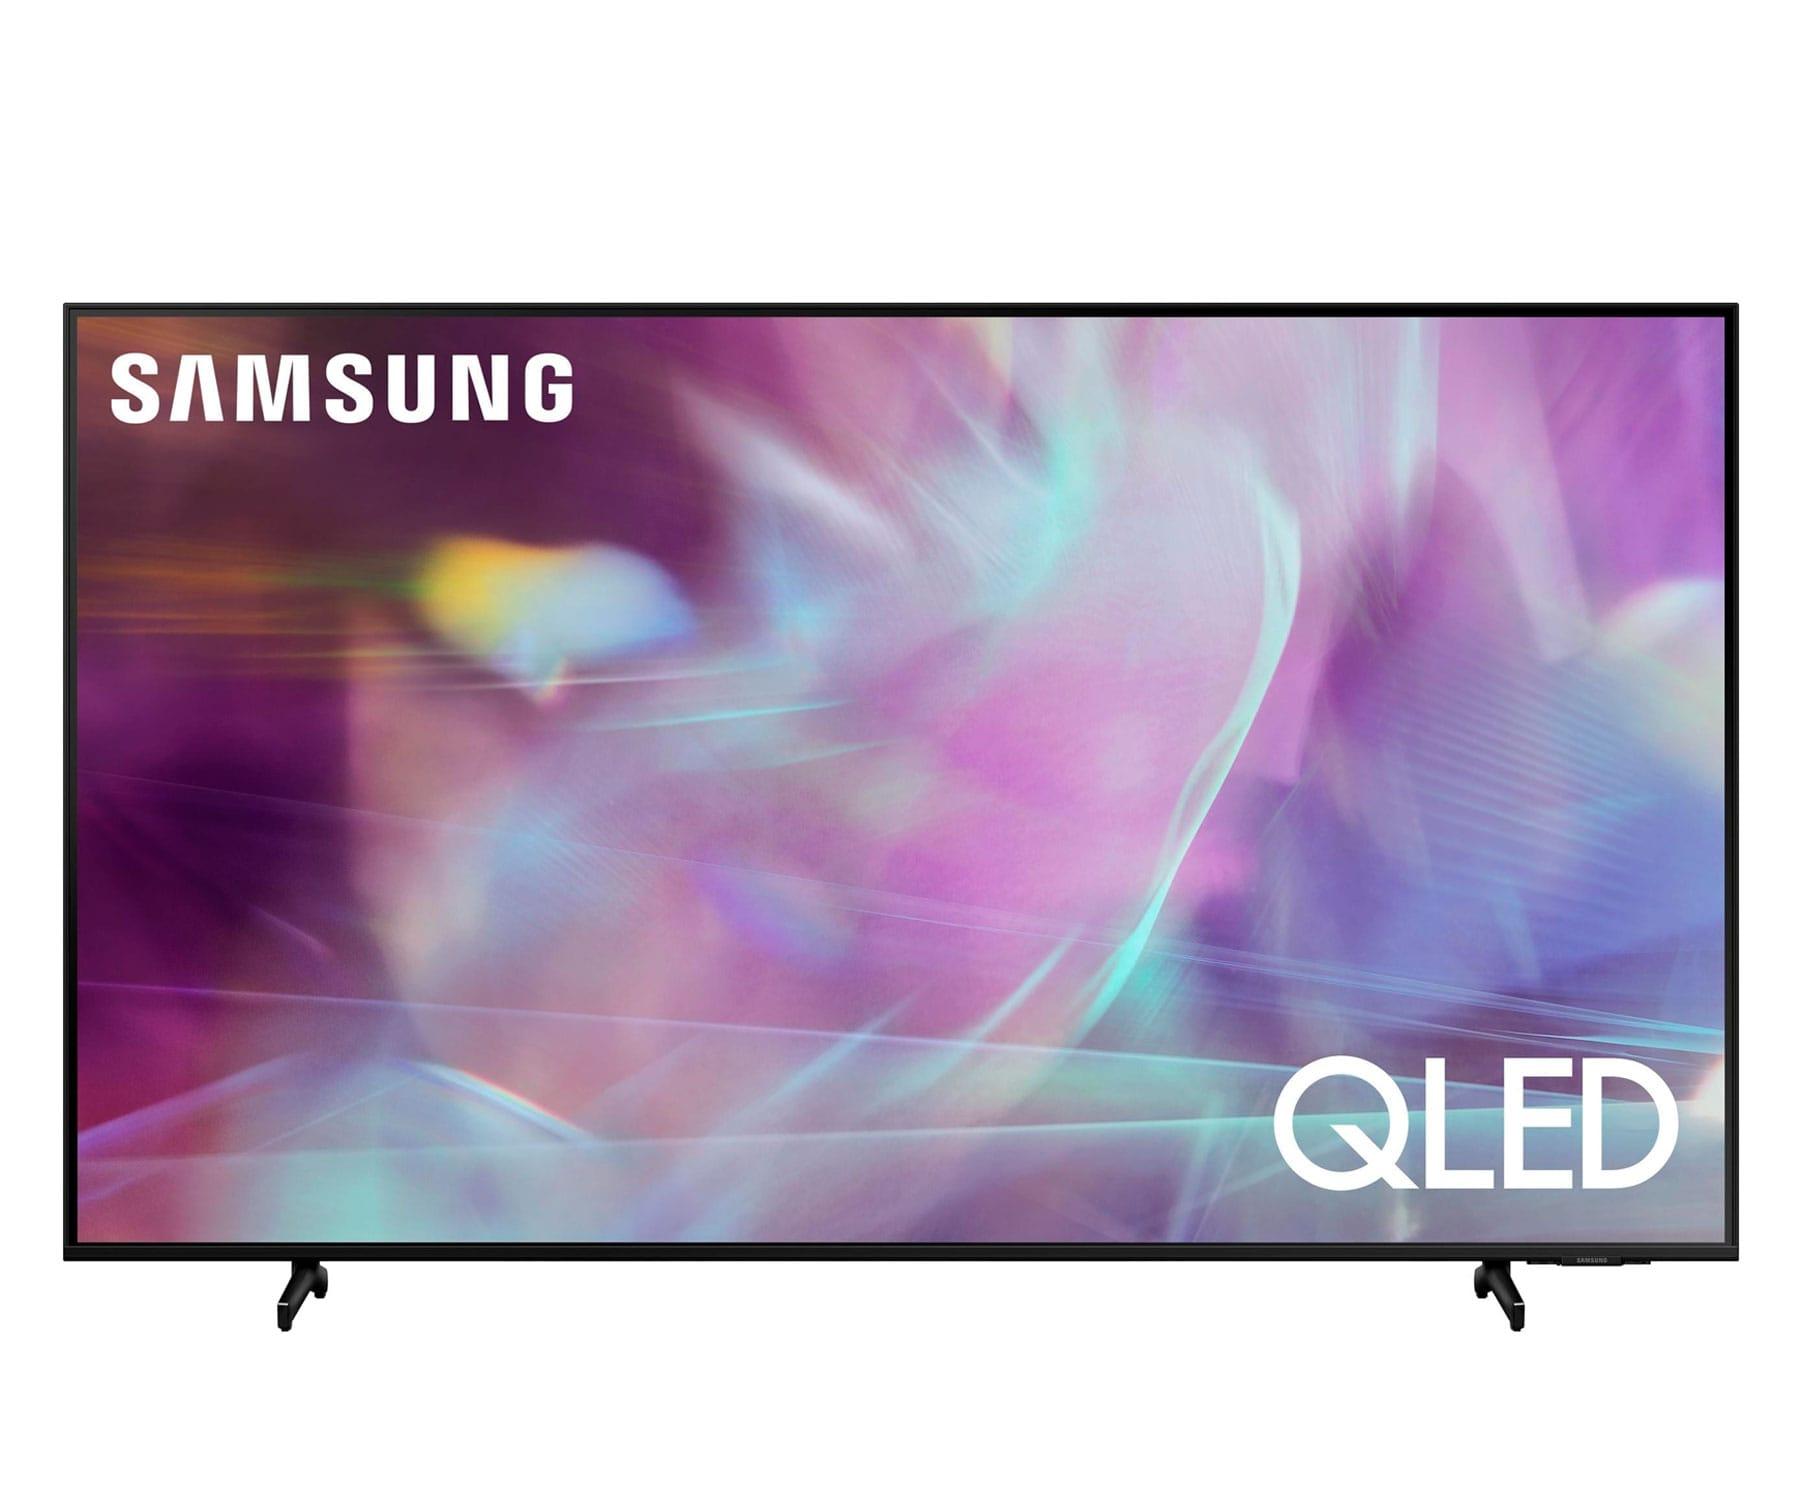 SAMSUNG QE43Q60A TELEVISOR SMART TV 43'' QLED UHD 4K HDR